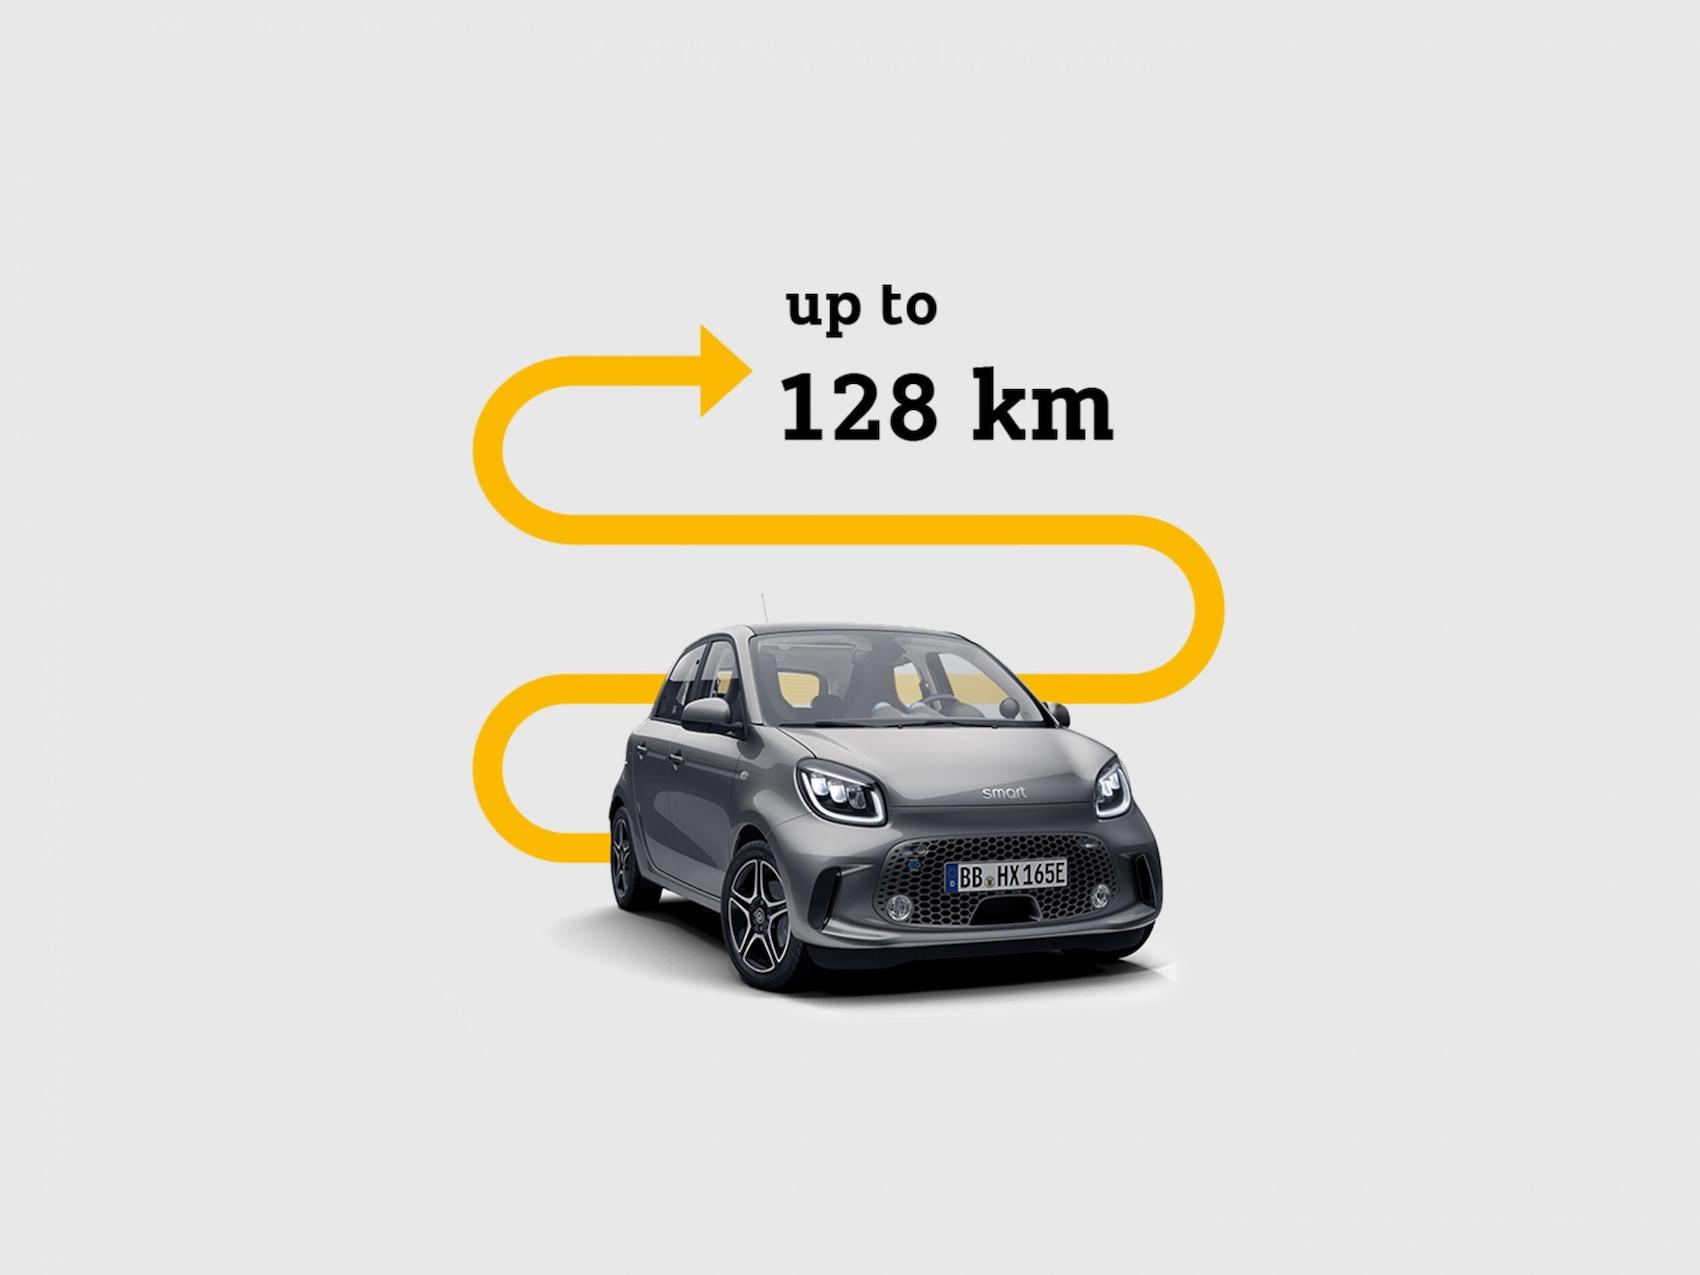 models-reach-128-km-forfour-CH.jpg